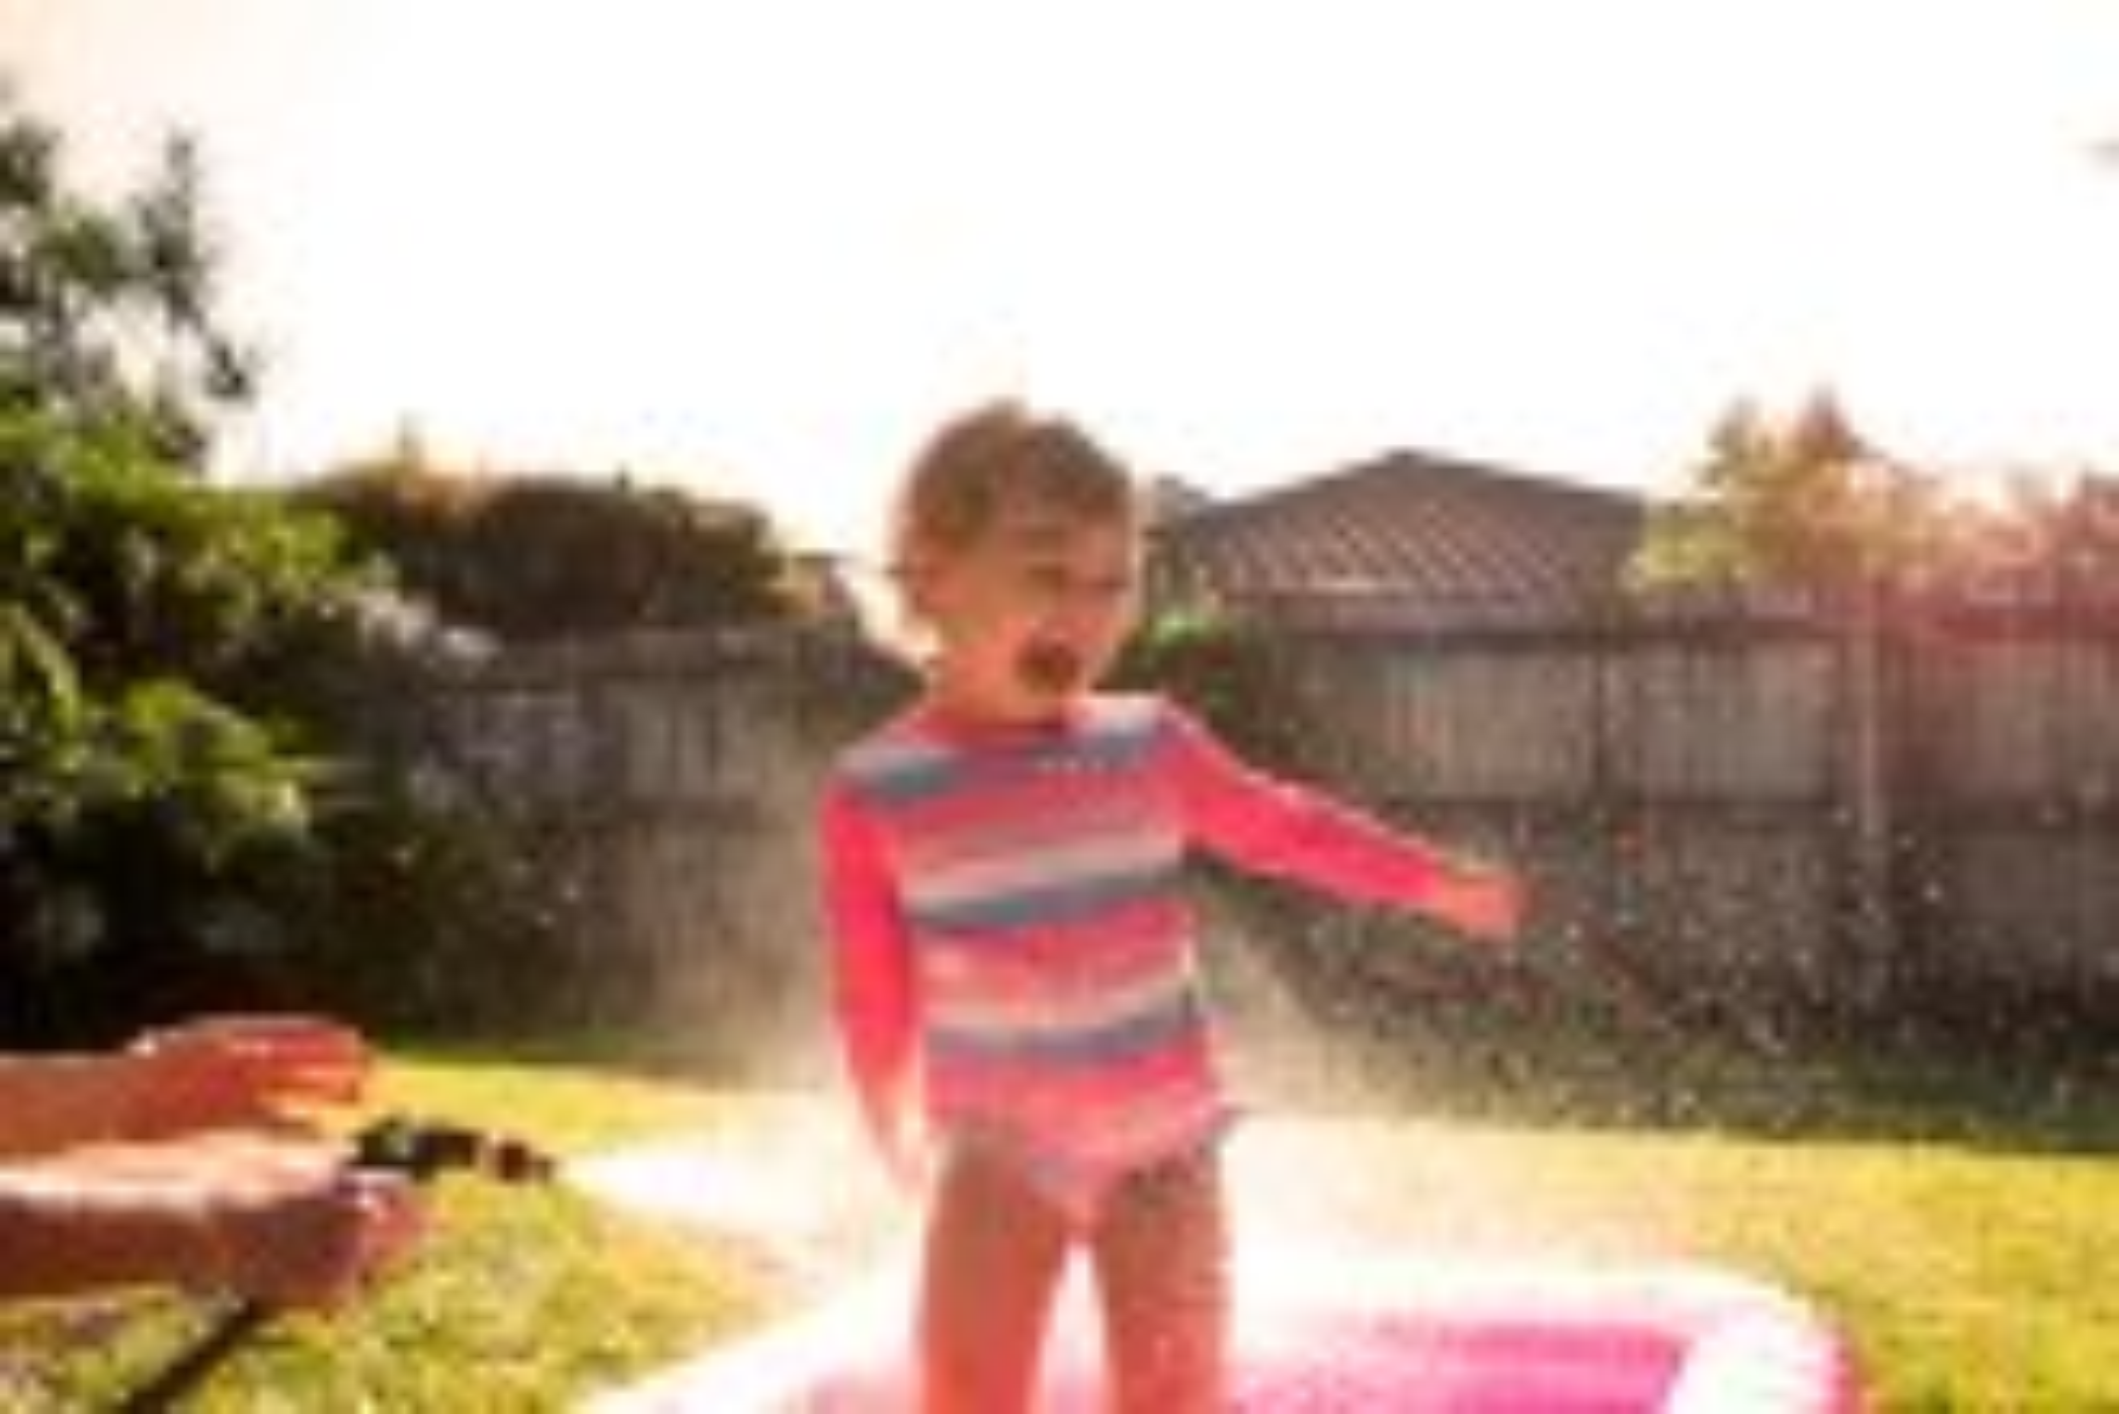 crianca-brincando-na-agua